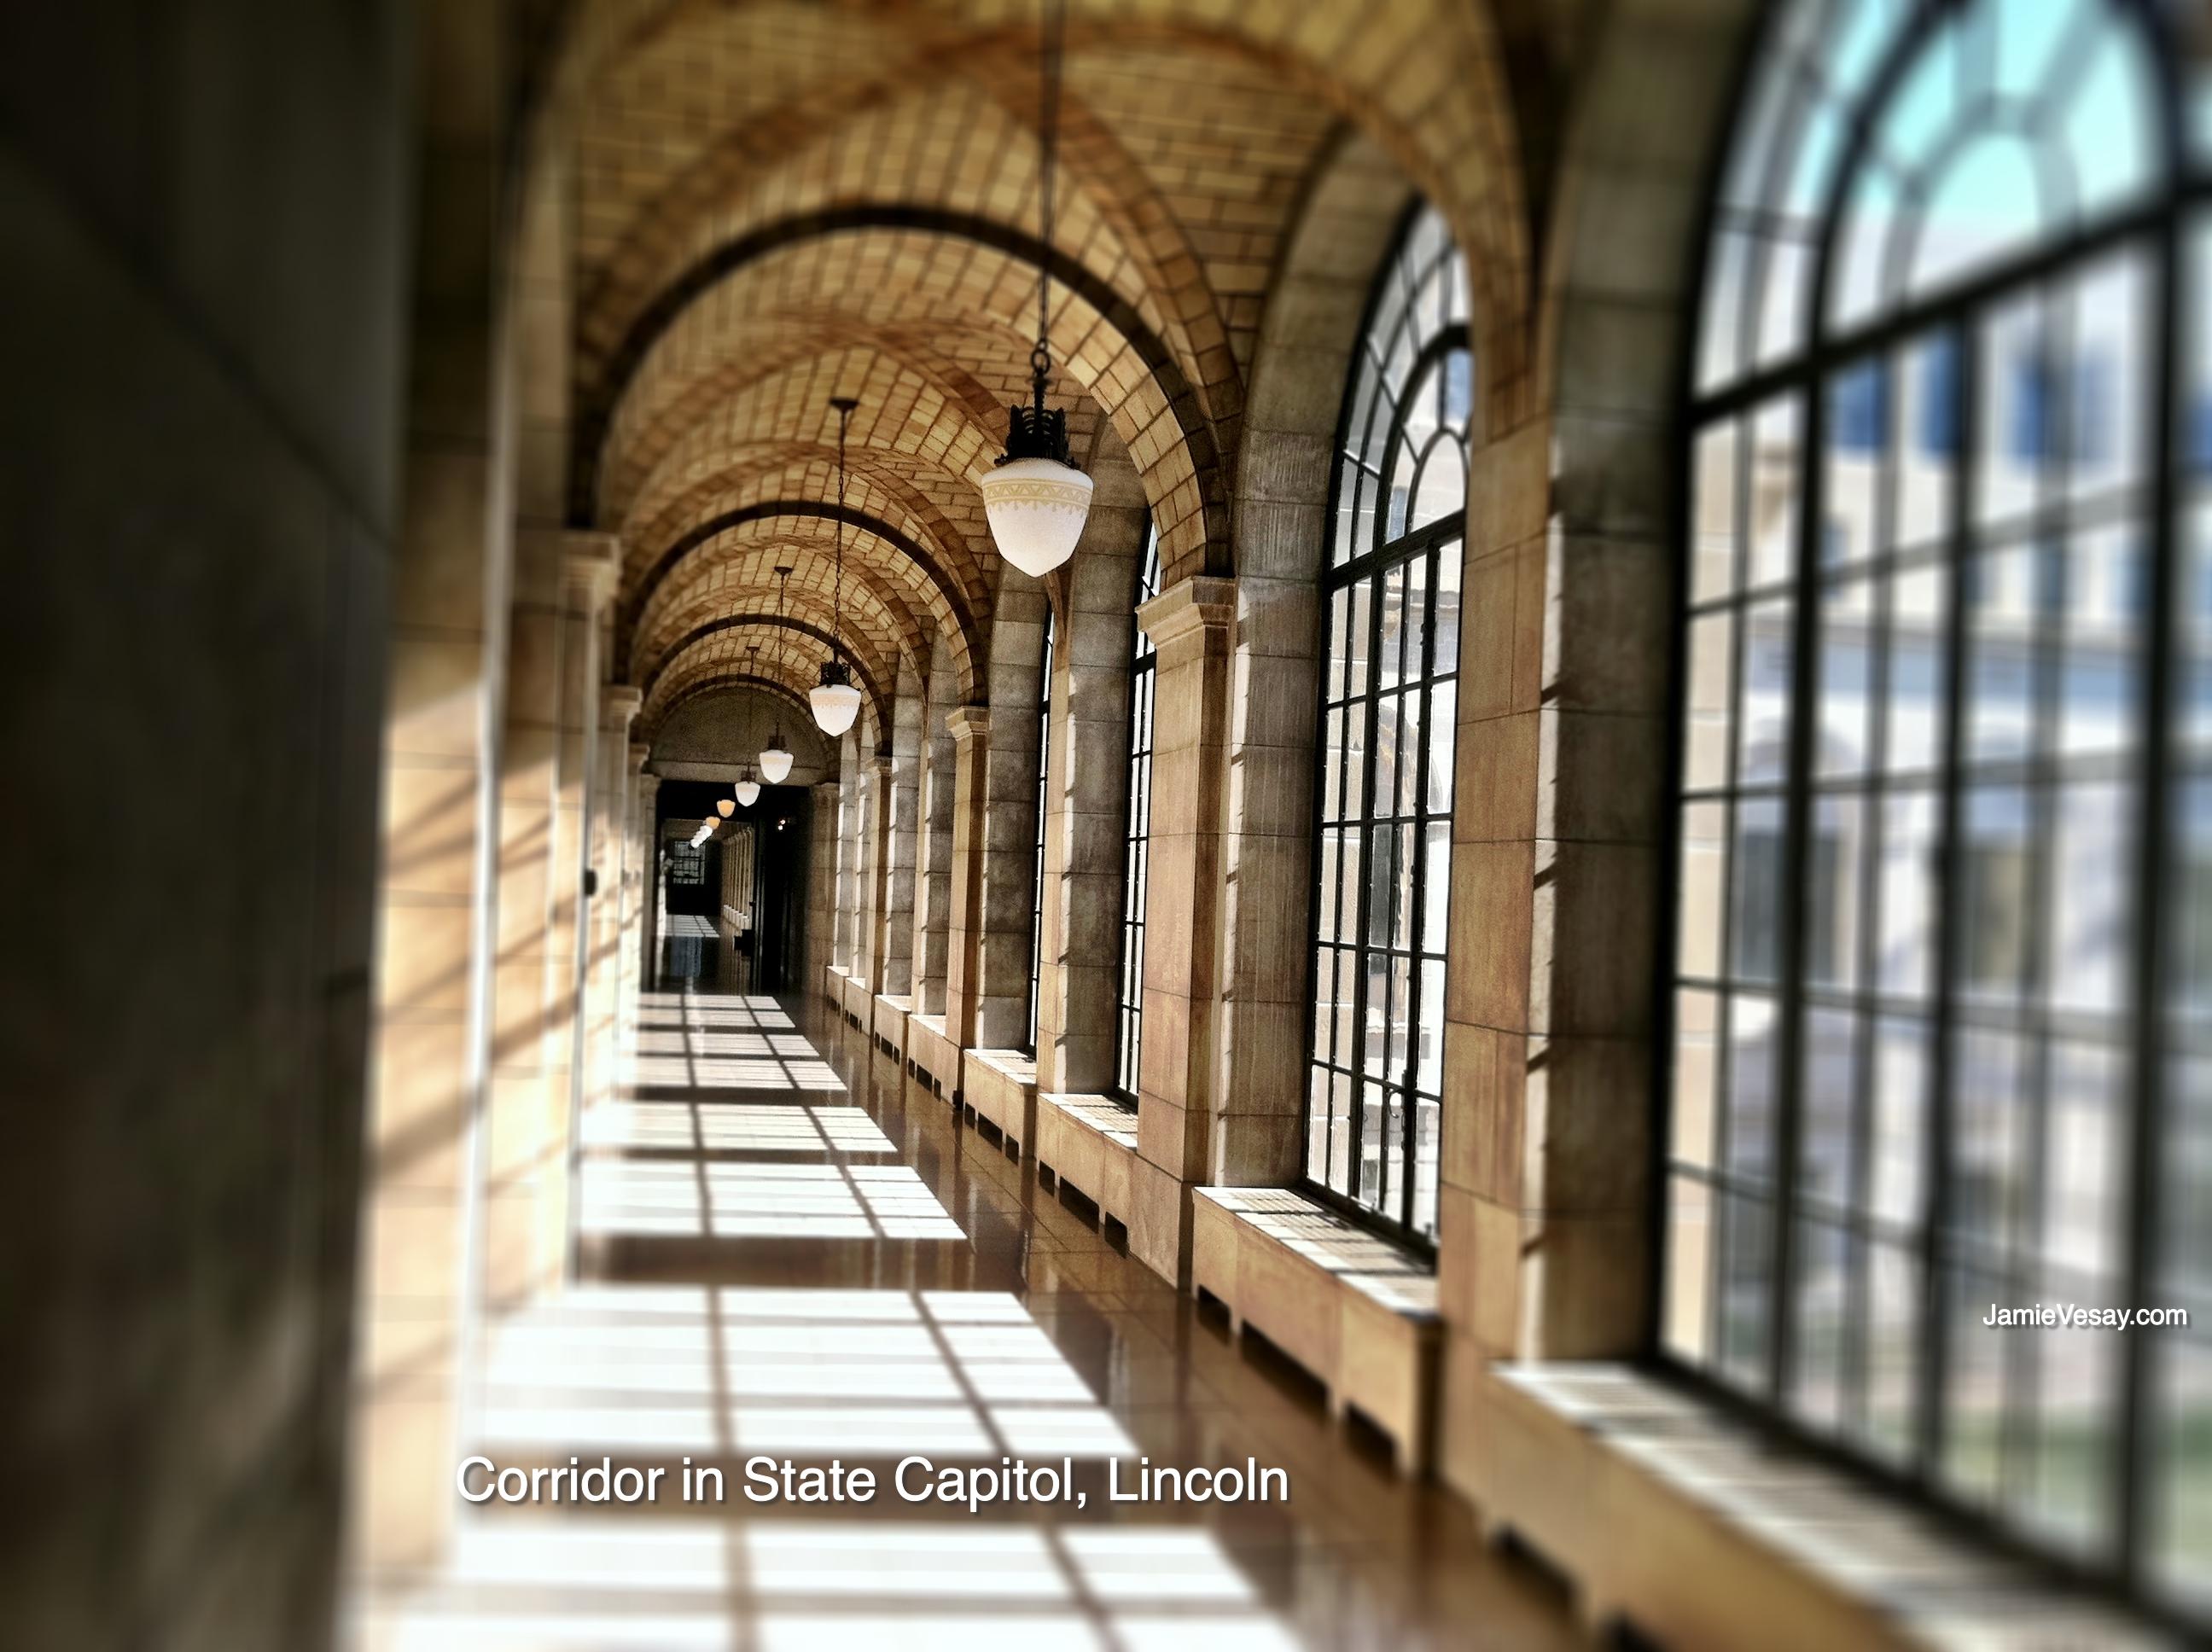 Lincoln Capitol walkway 2011 Jamie Vesay WM LBLD treated IMG_1888